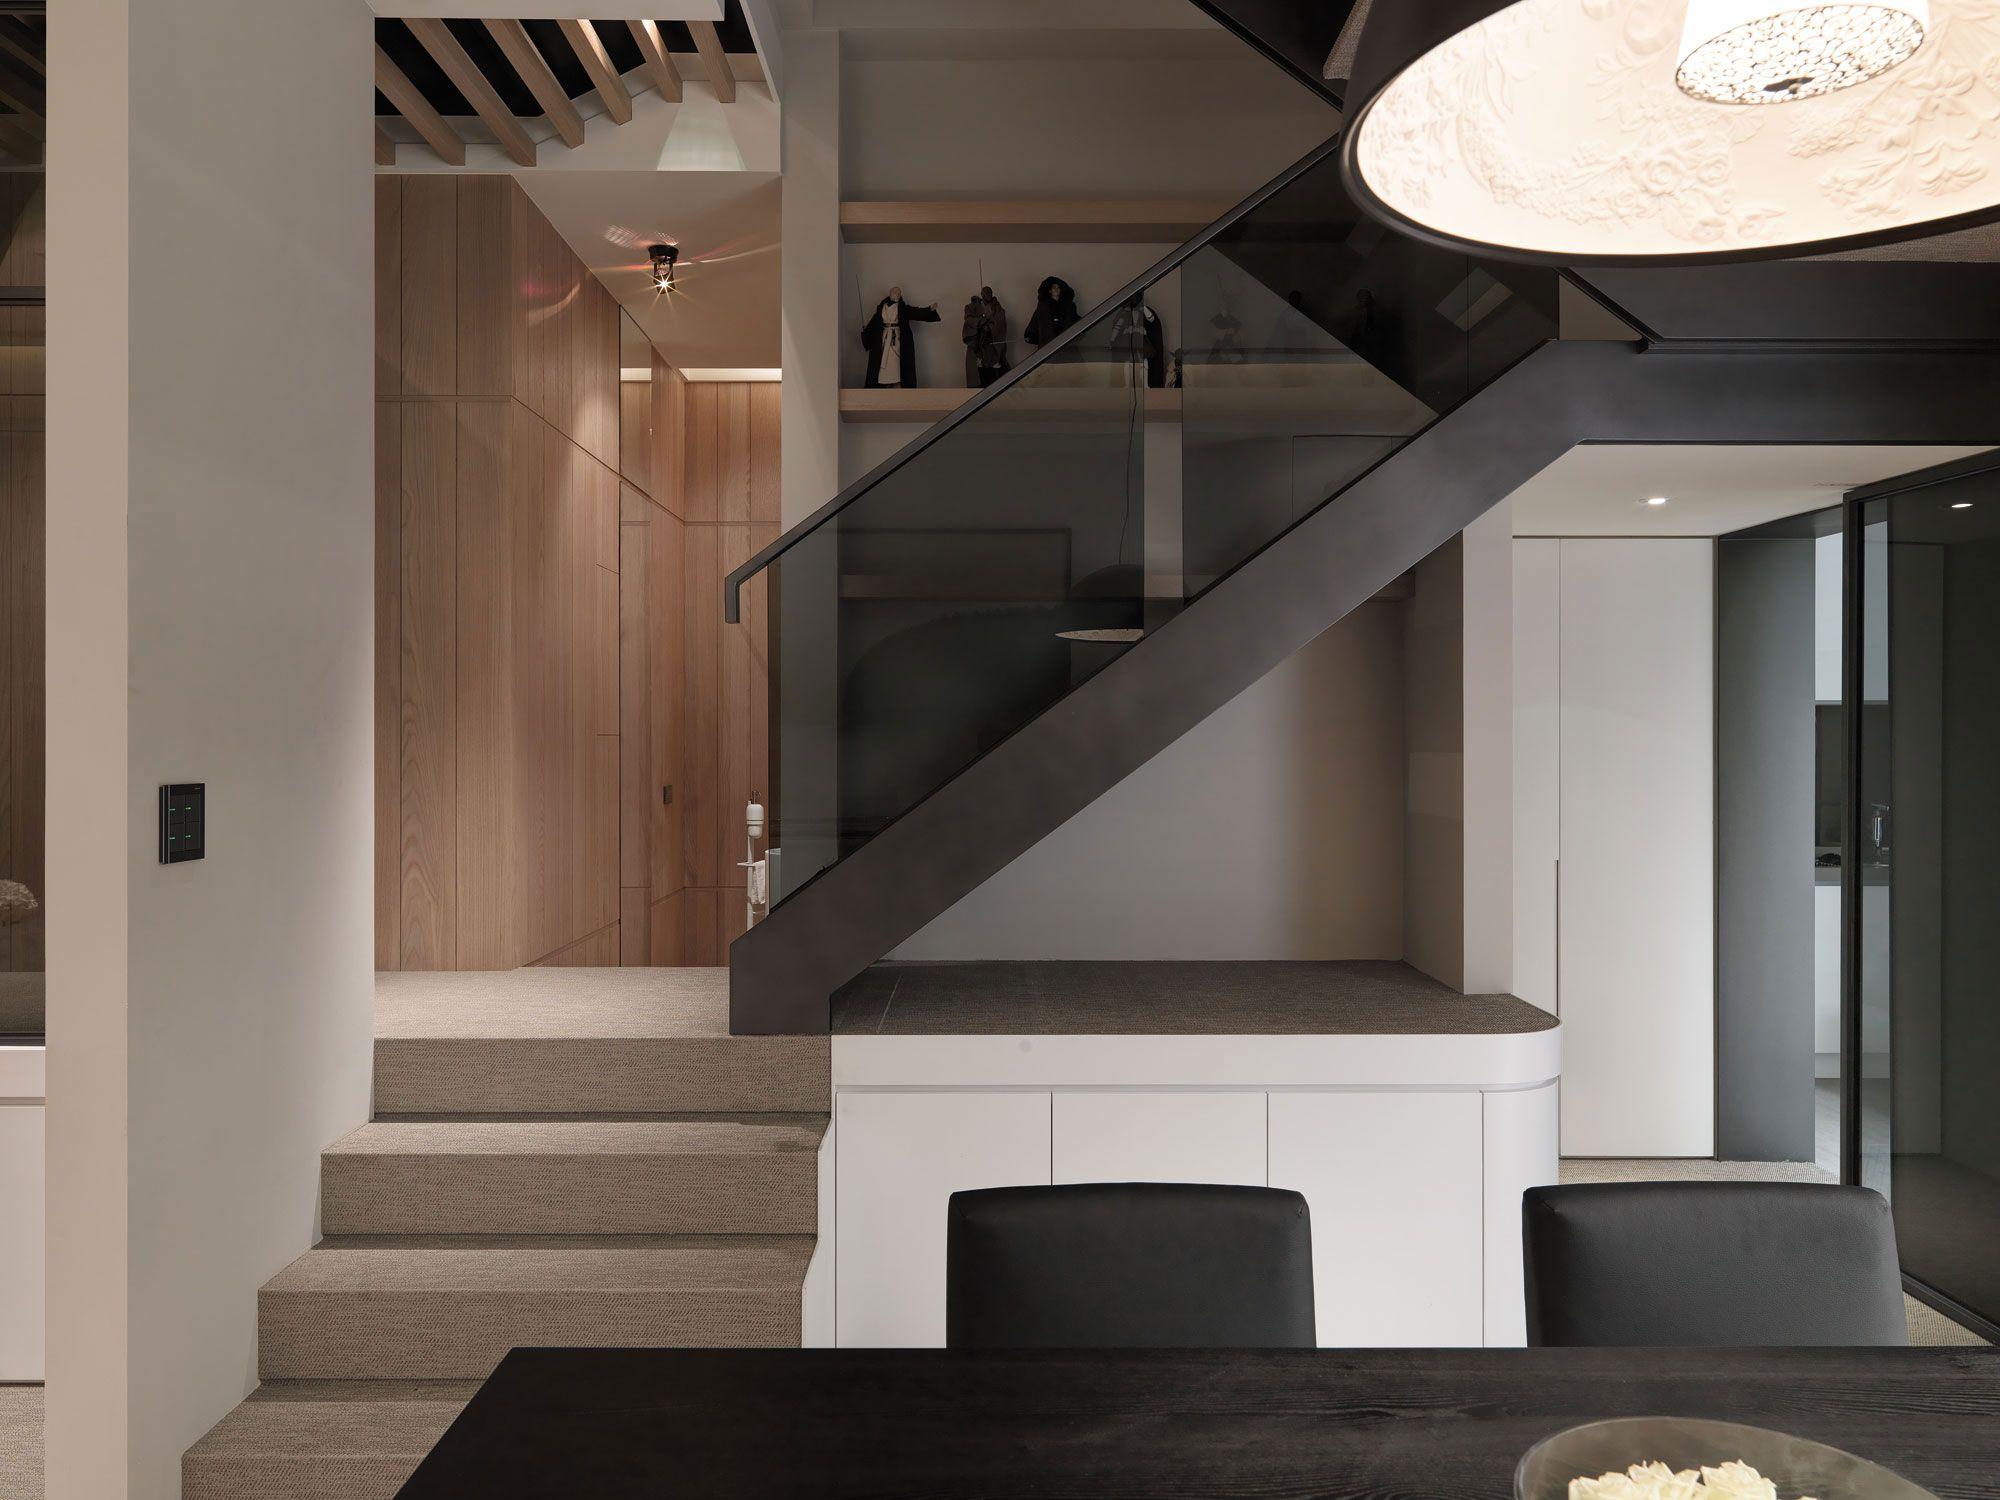 A-Multilevel-Contemporary-Apartment-12